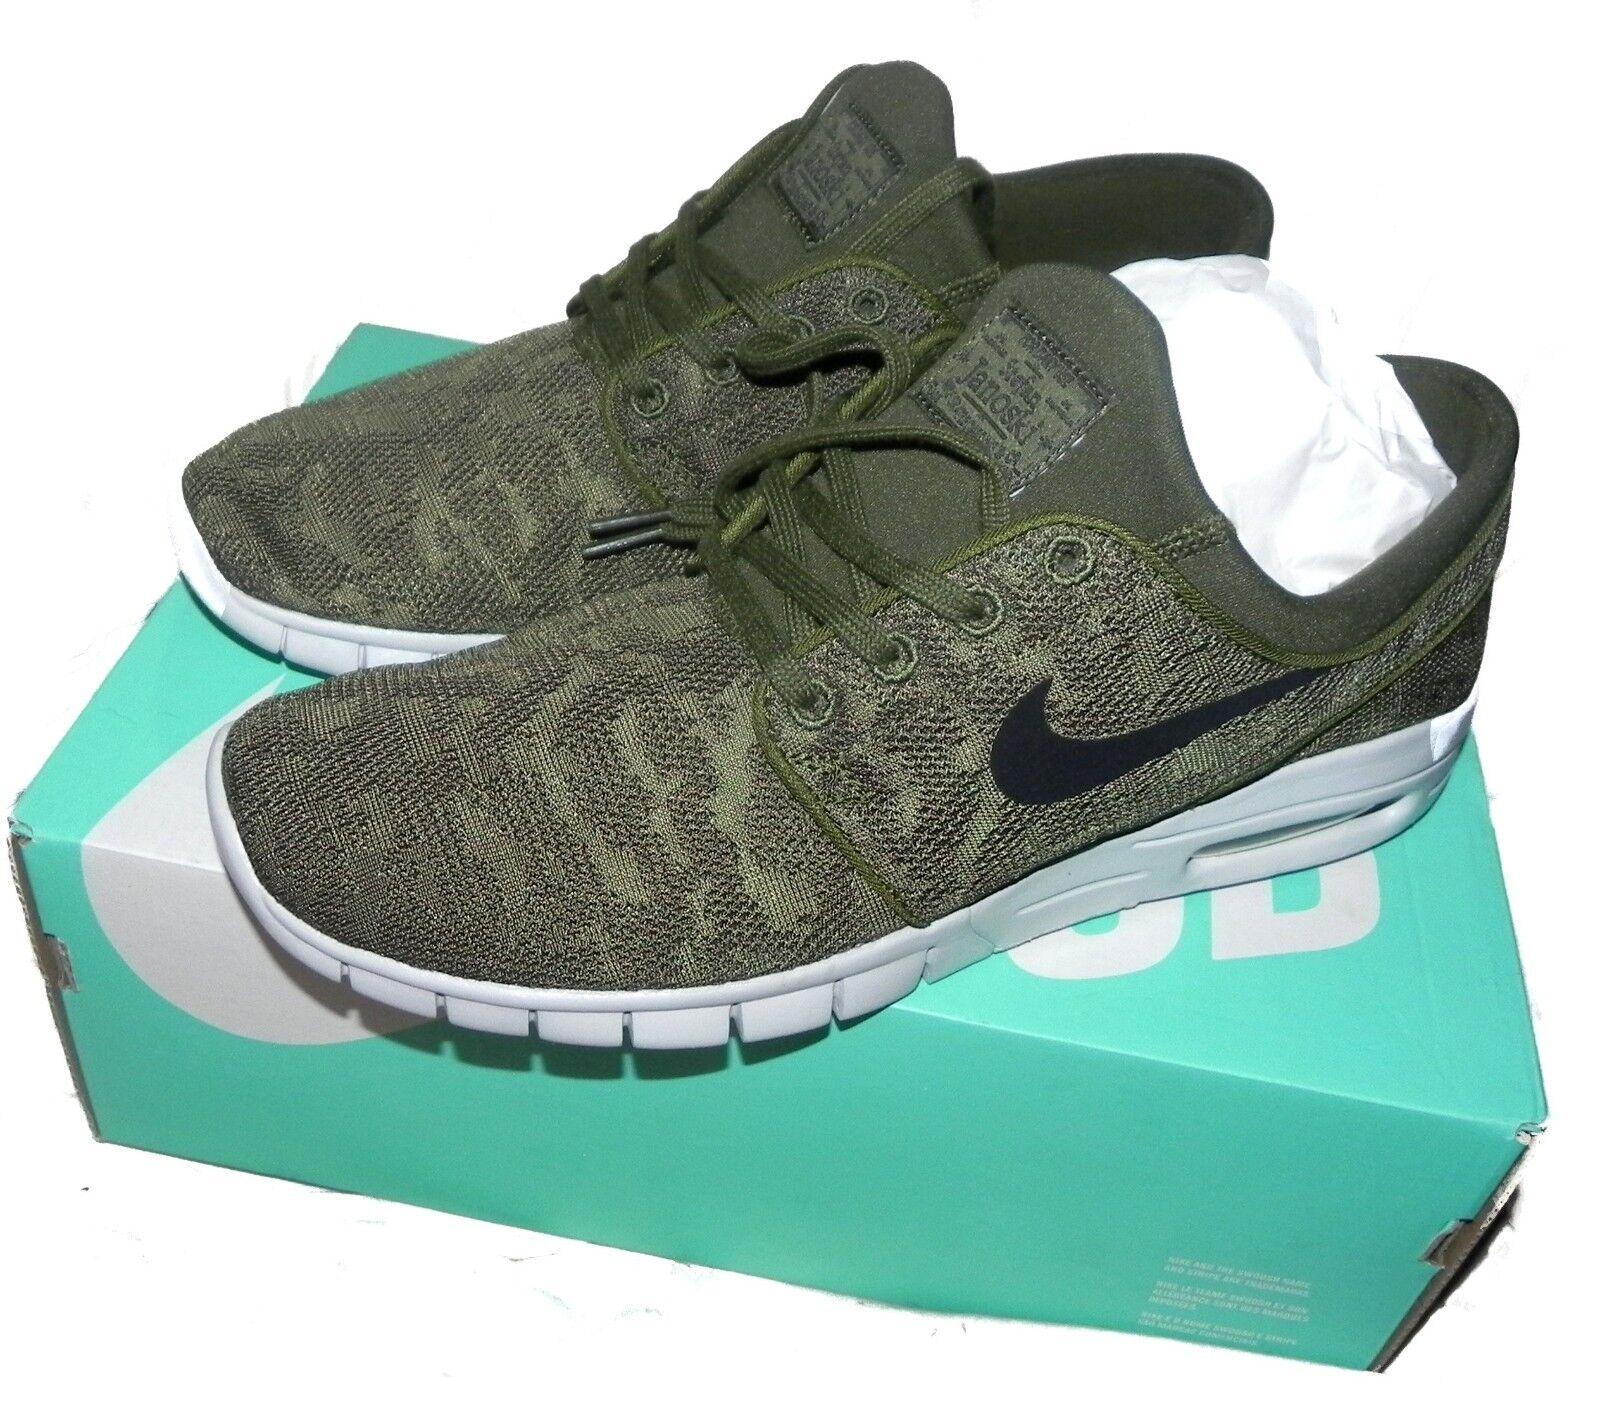 Nike sb stefan janoski max legion grüne schwarze schwarze schwarze 631303 300 größe 10,5 nwb 110 dollar d4d589